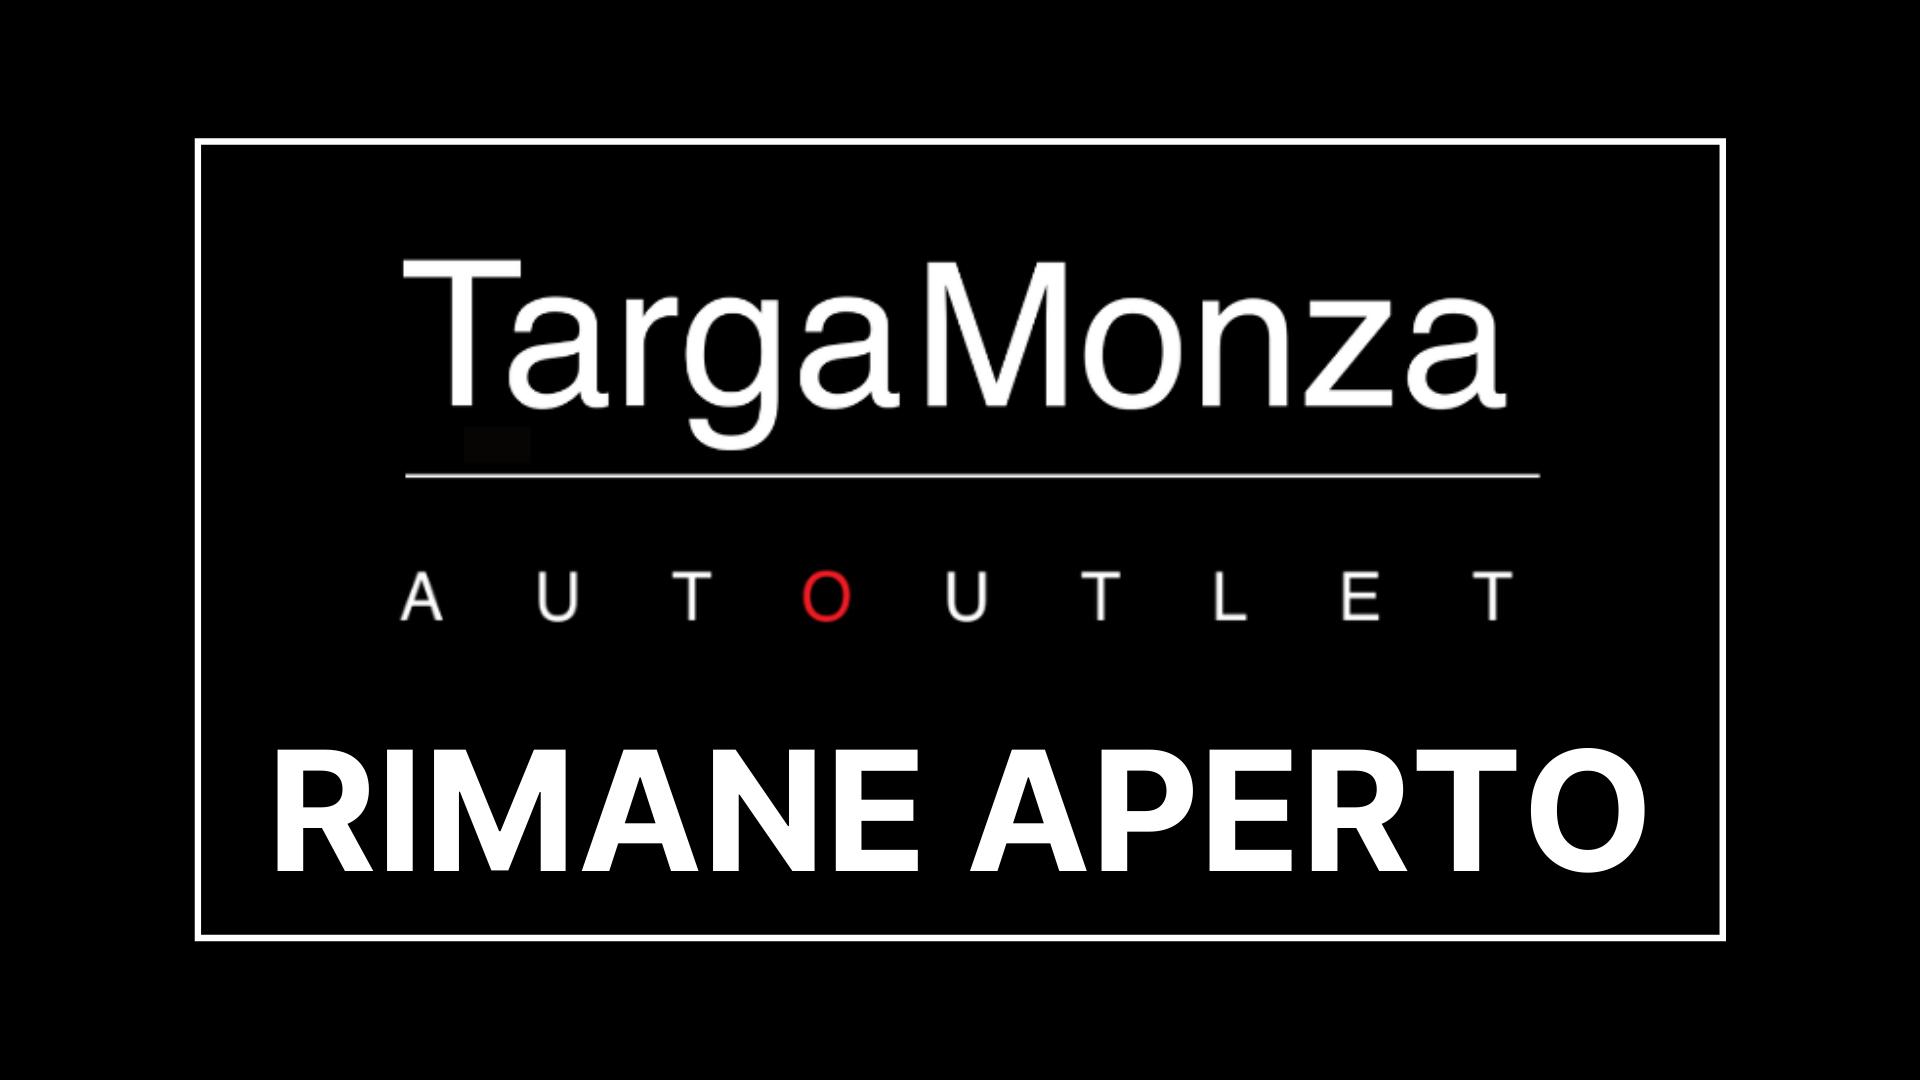 Targa Monza rimane aperto